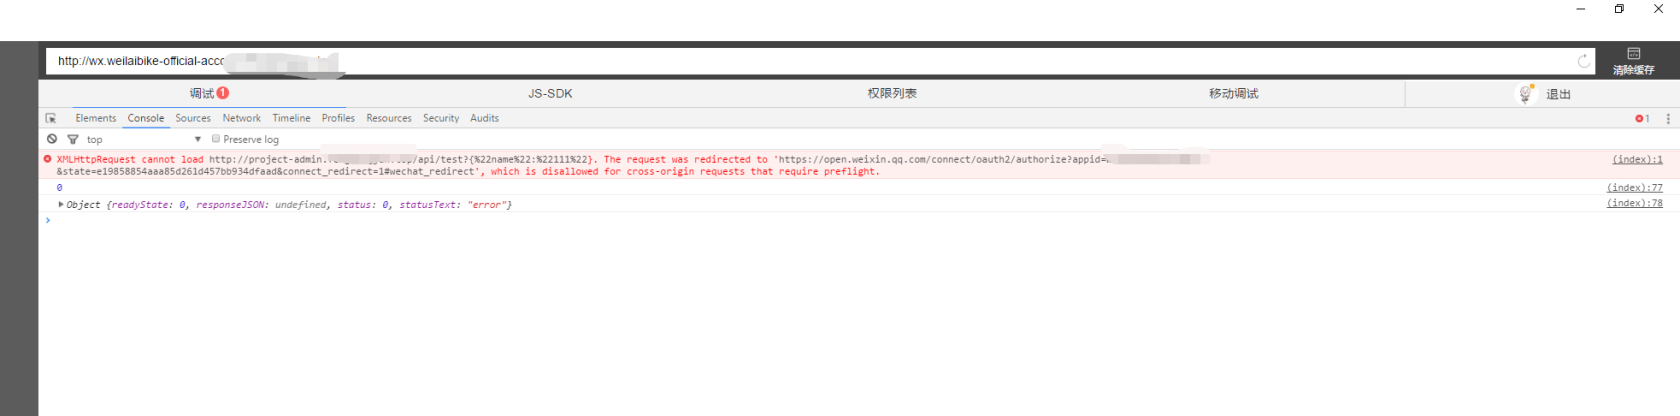 微信网页授权出现跨域(使用easywechat的oauth中间件)